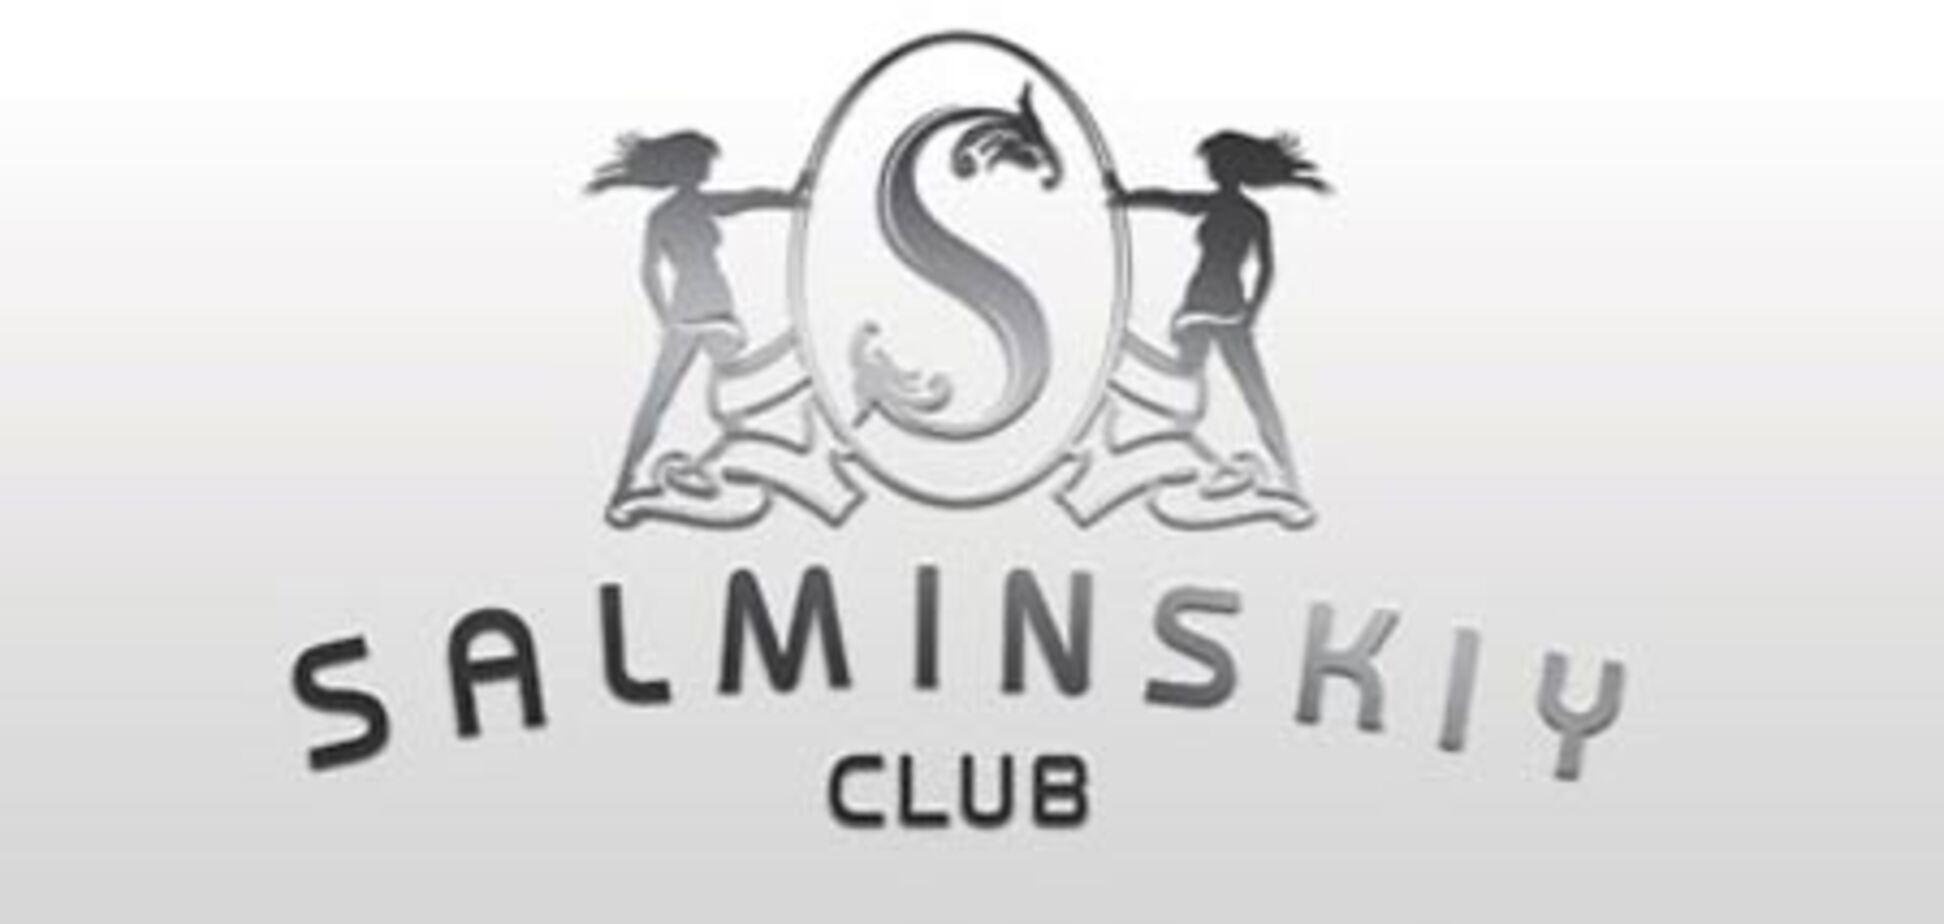 Salminskiy